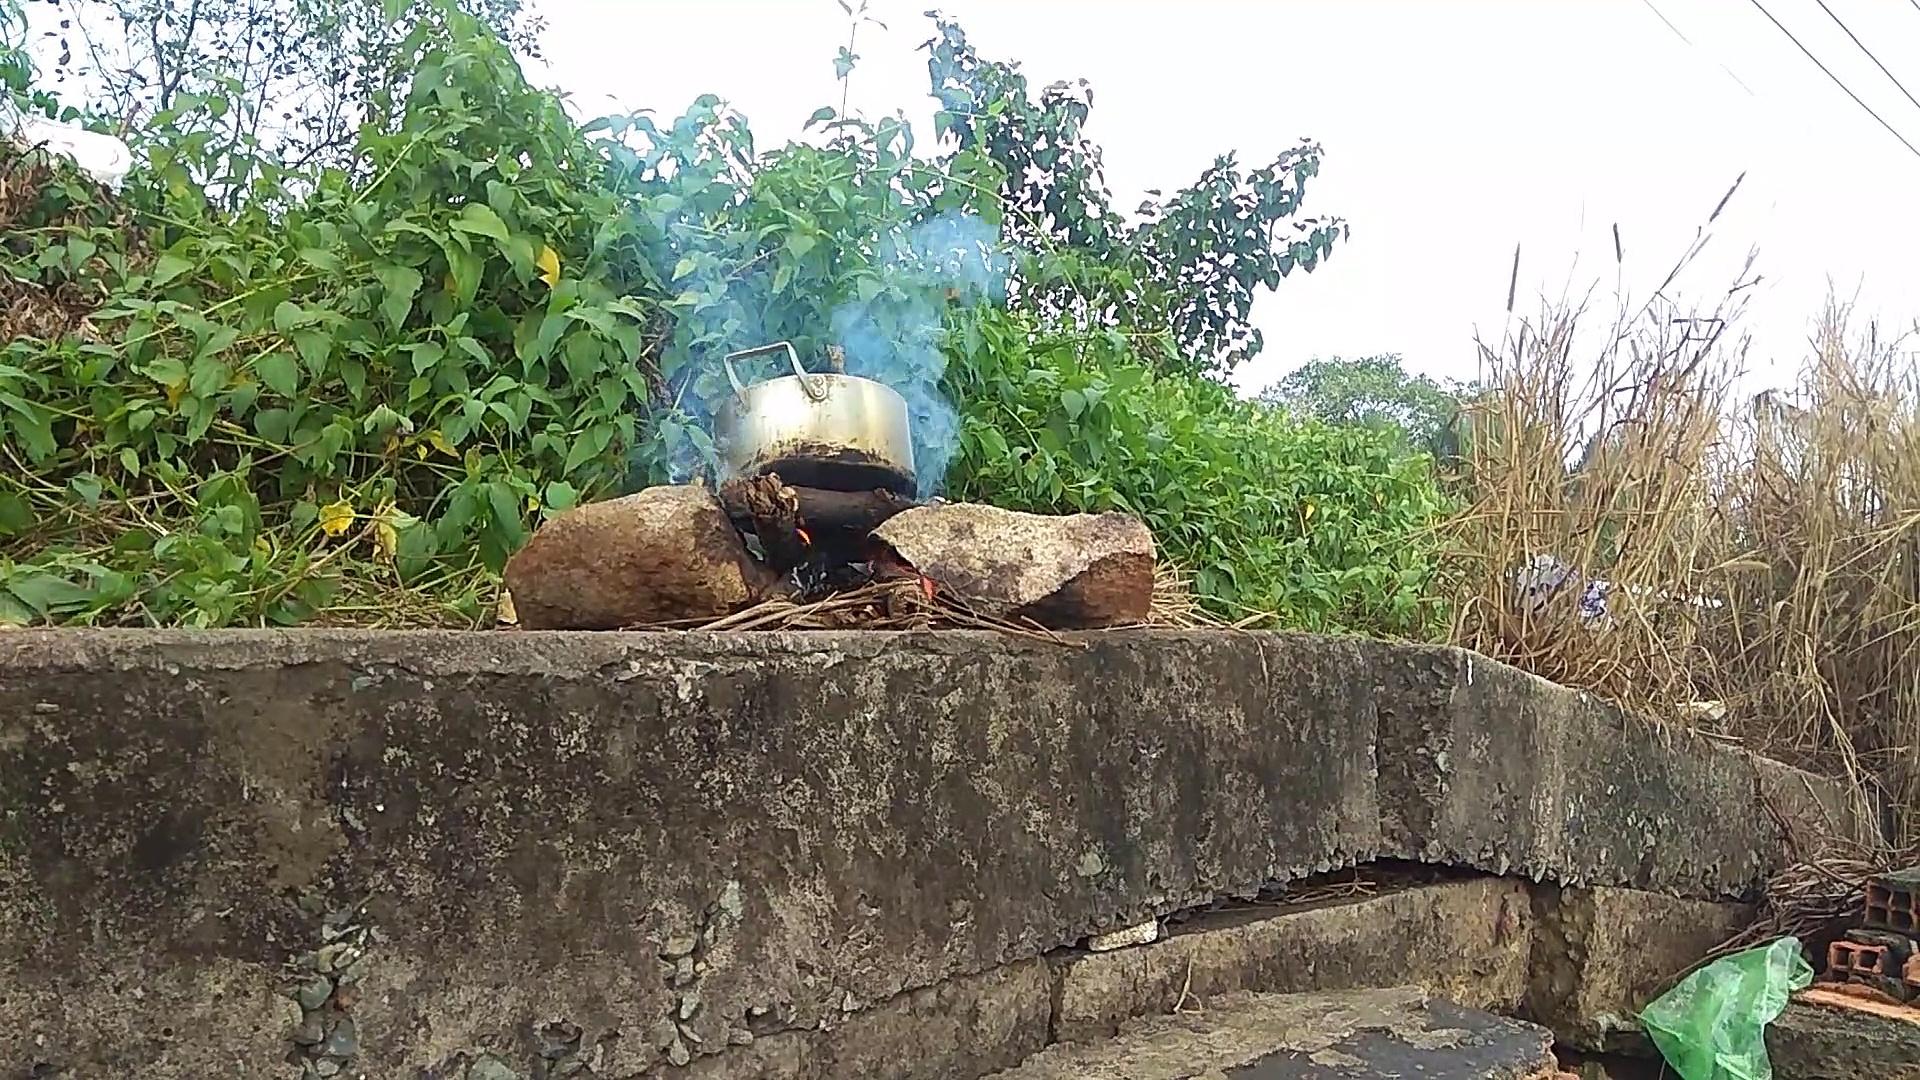 Easy Crispy Pork Belly Cooking | Eating Crispy Pork